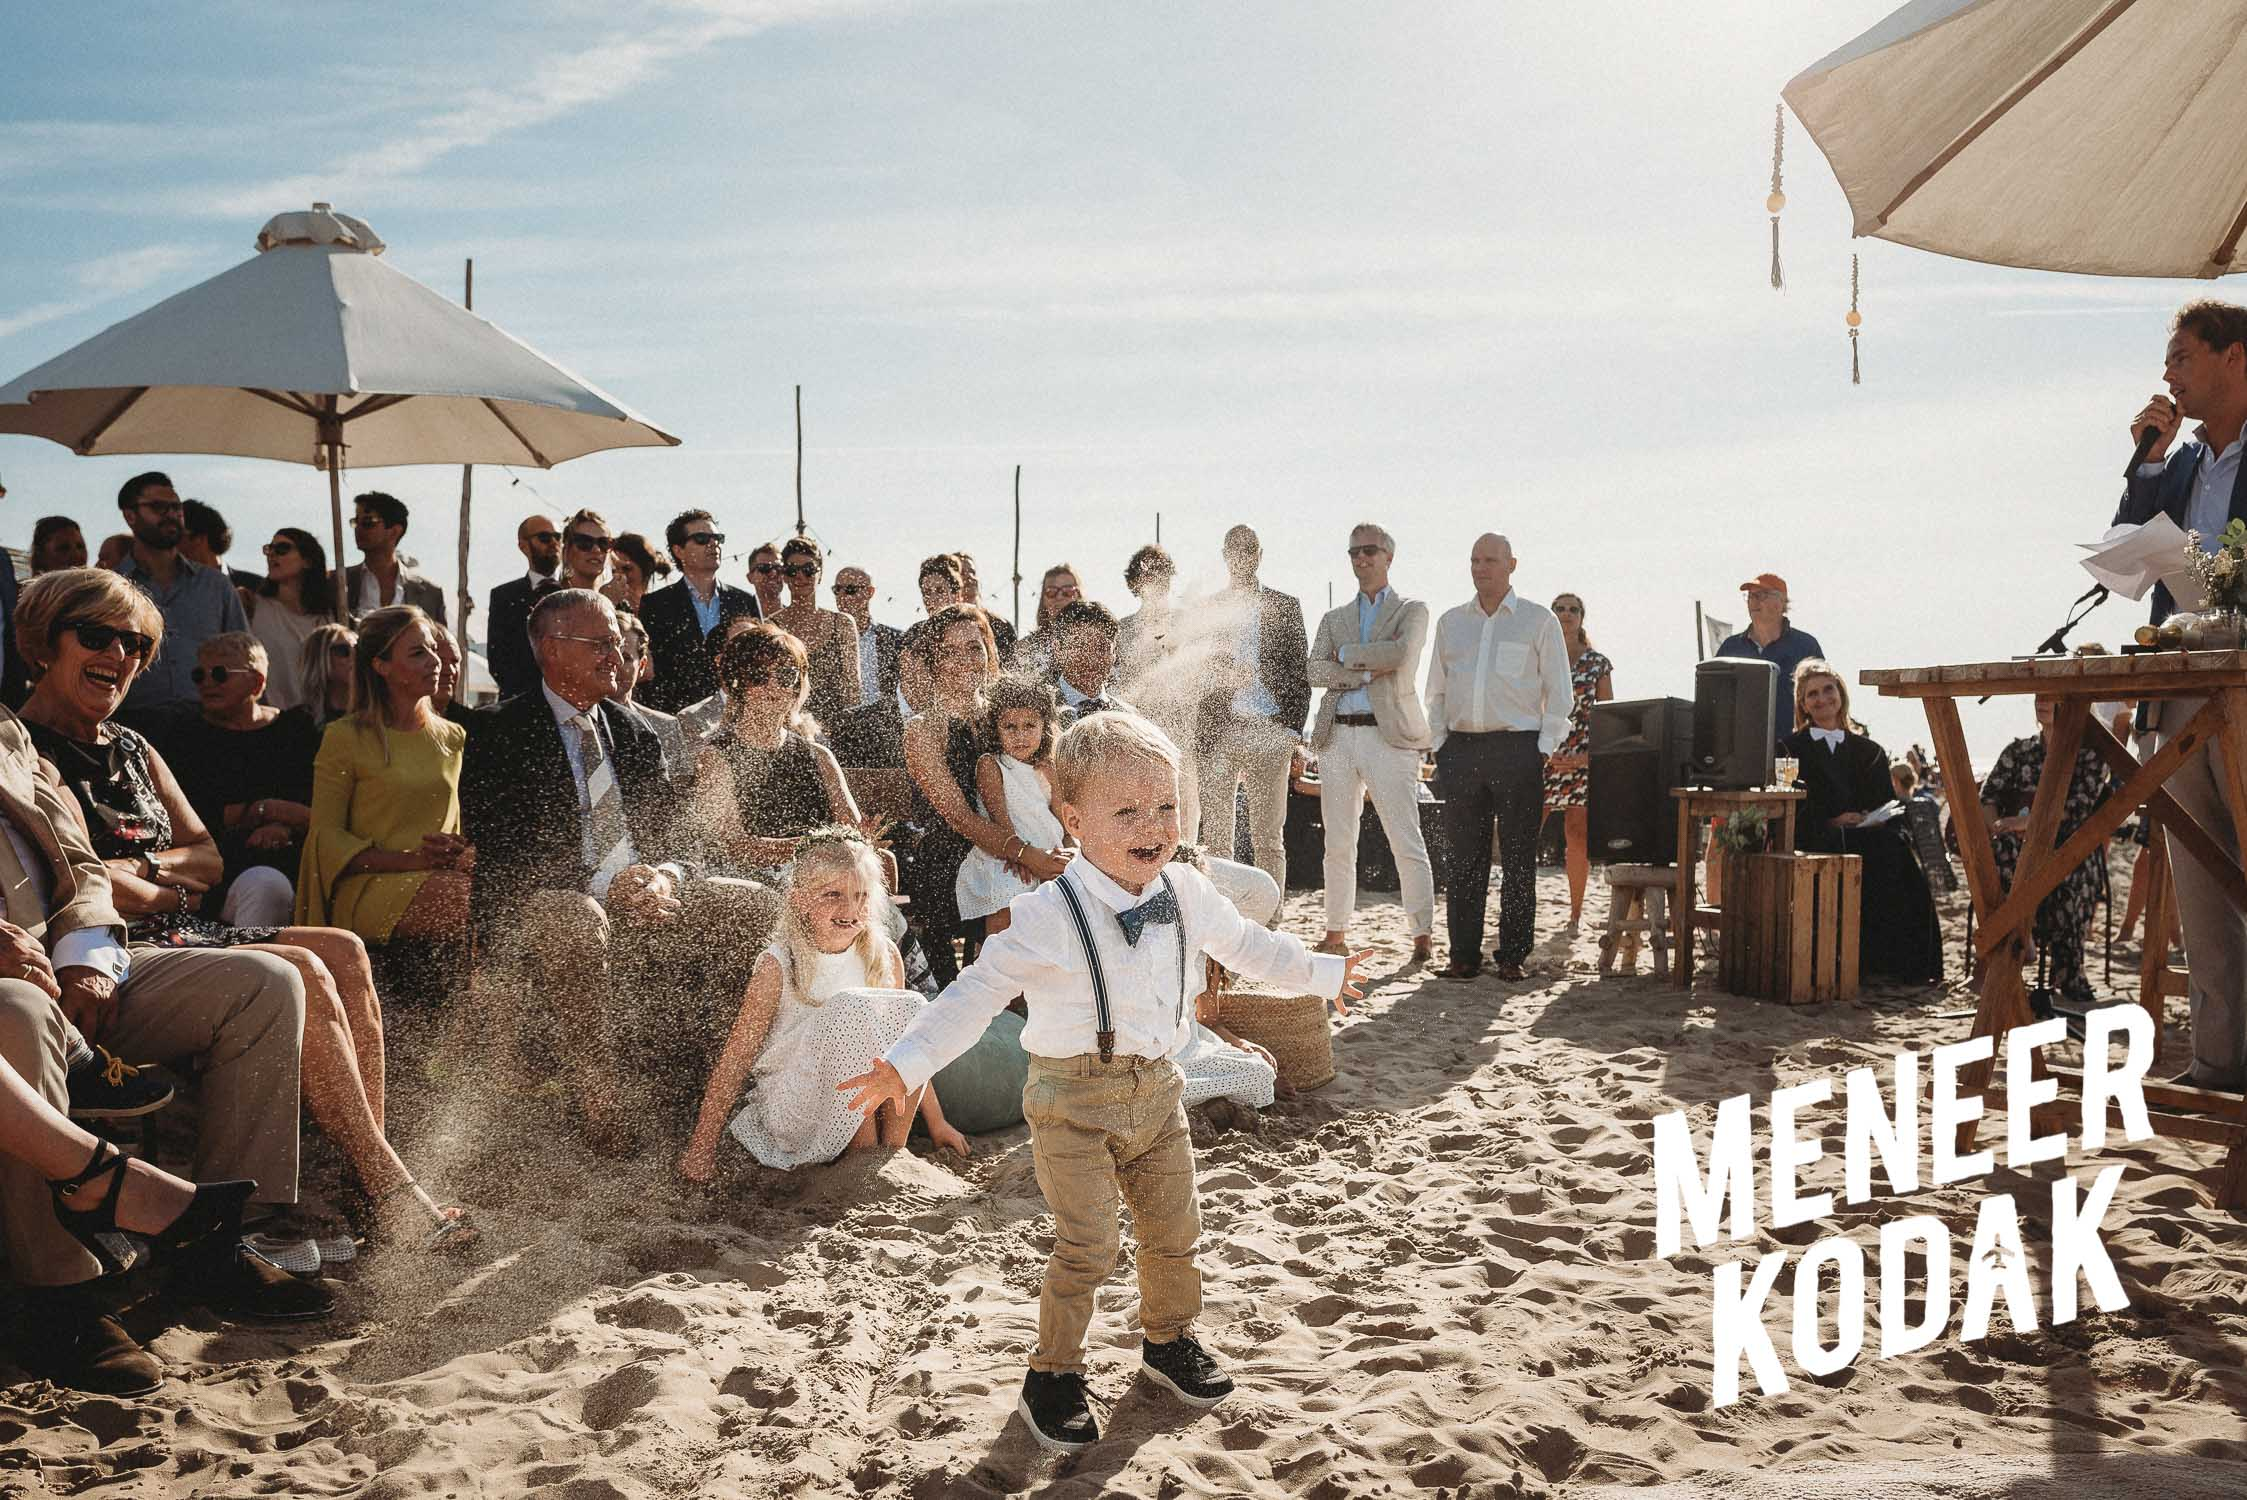 Meneer Kodak - Strandbruiloft - Noordwijk - K&A-088.jpg